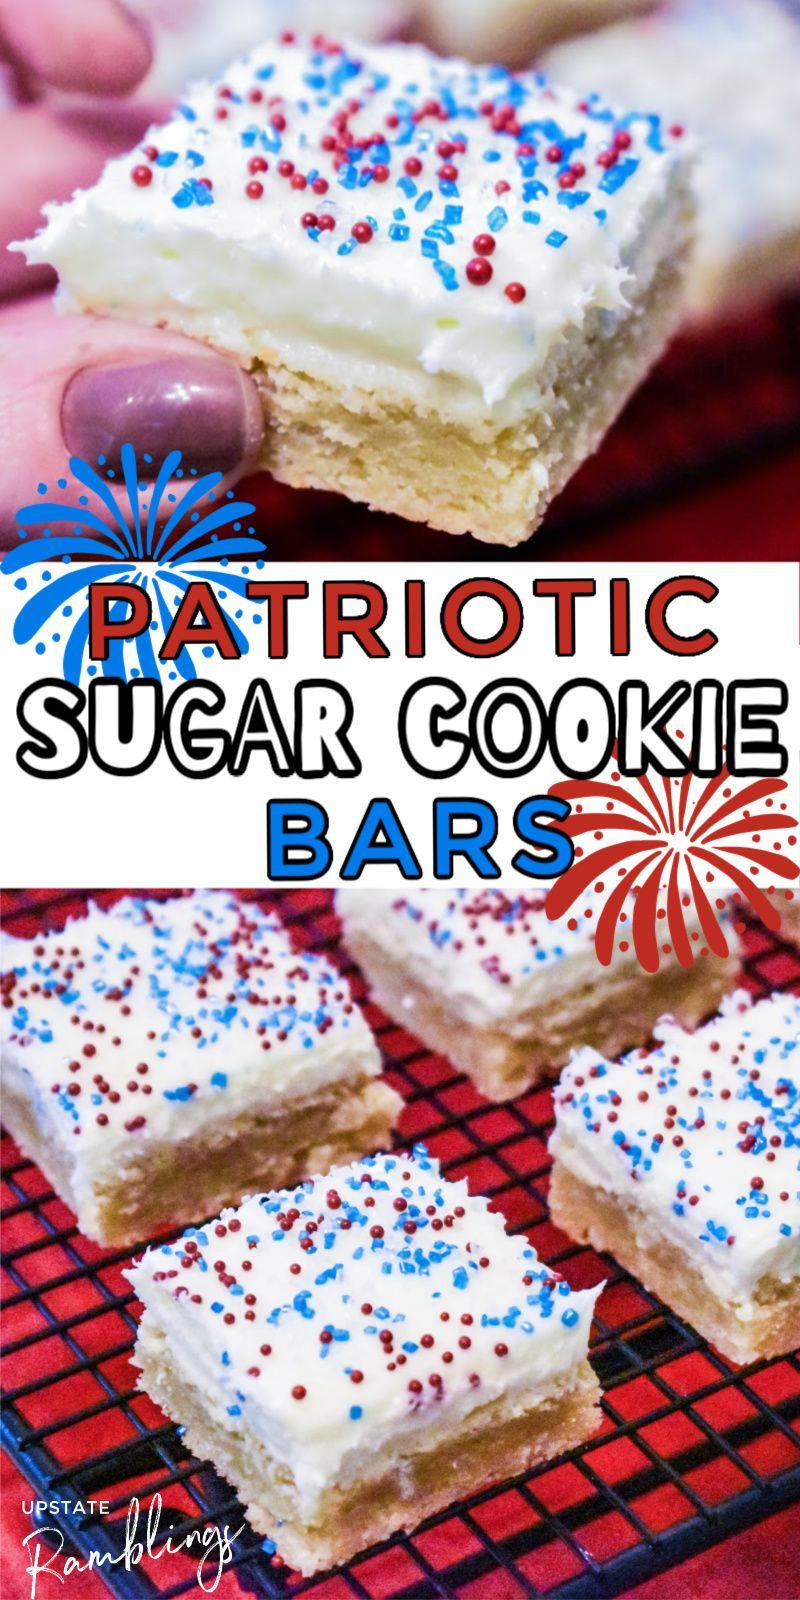 , Patriotic Sugar Cookie Bars – easy, MySummer Combin Blog, MySummer Combin Blog